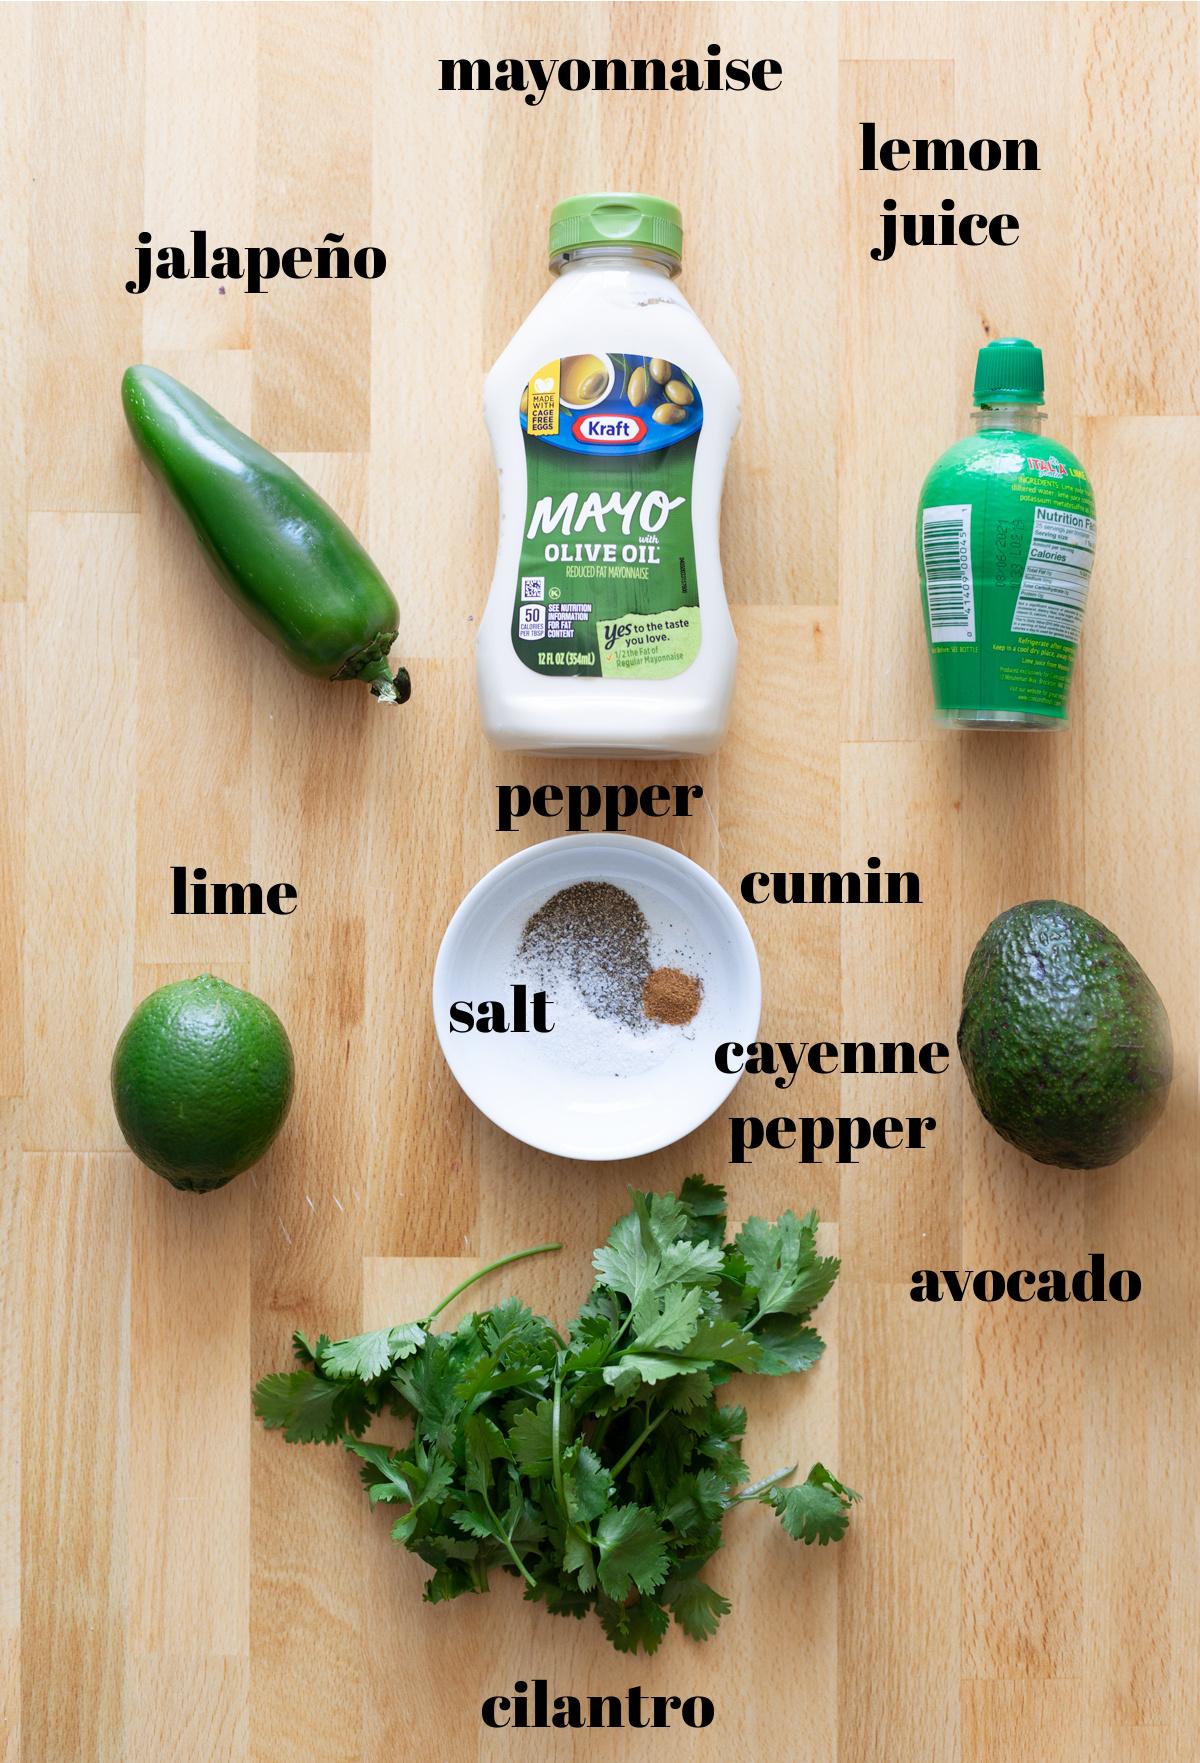 mayonnaise, avocado, lemon and lime juice and seasonings on table.